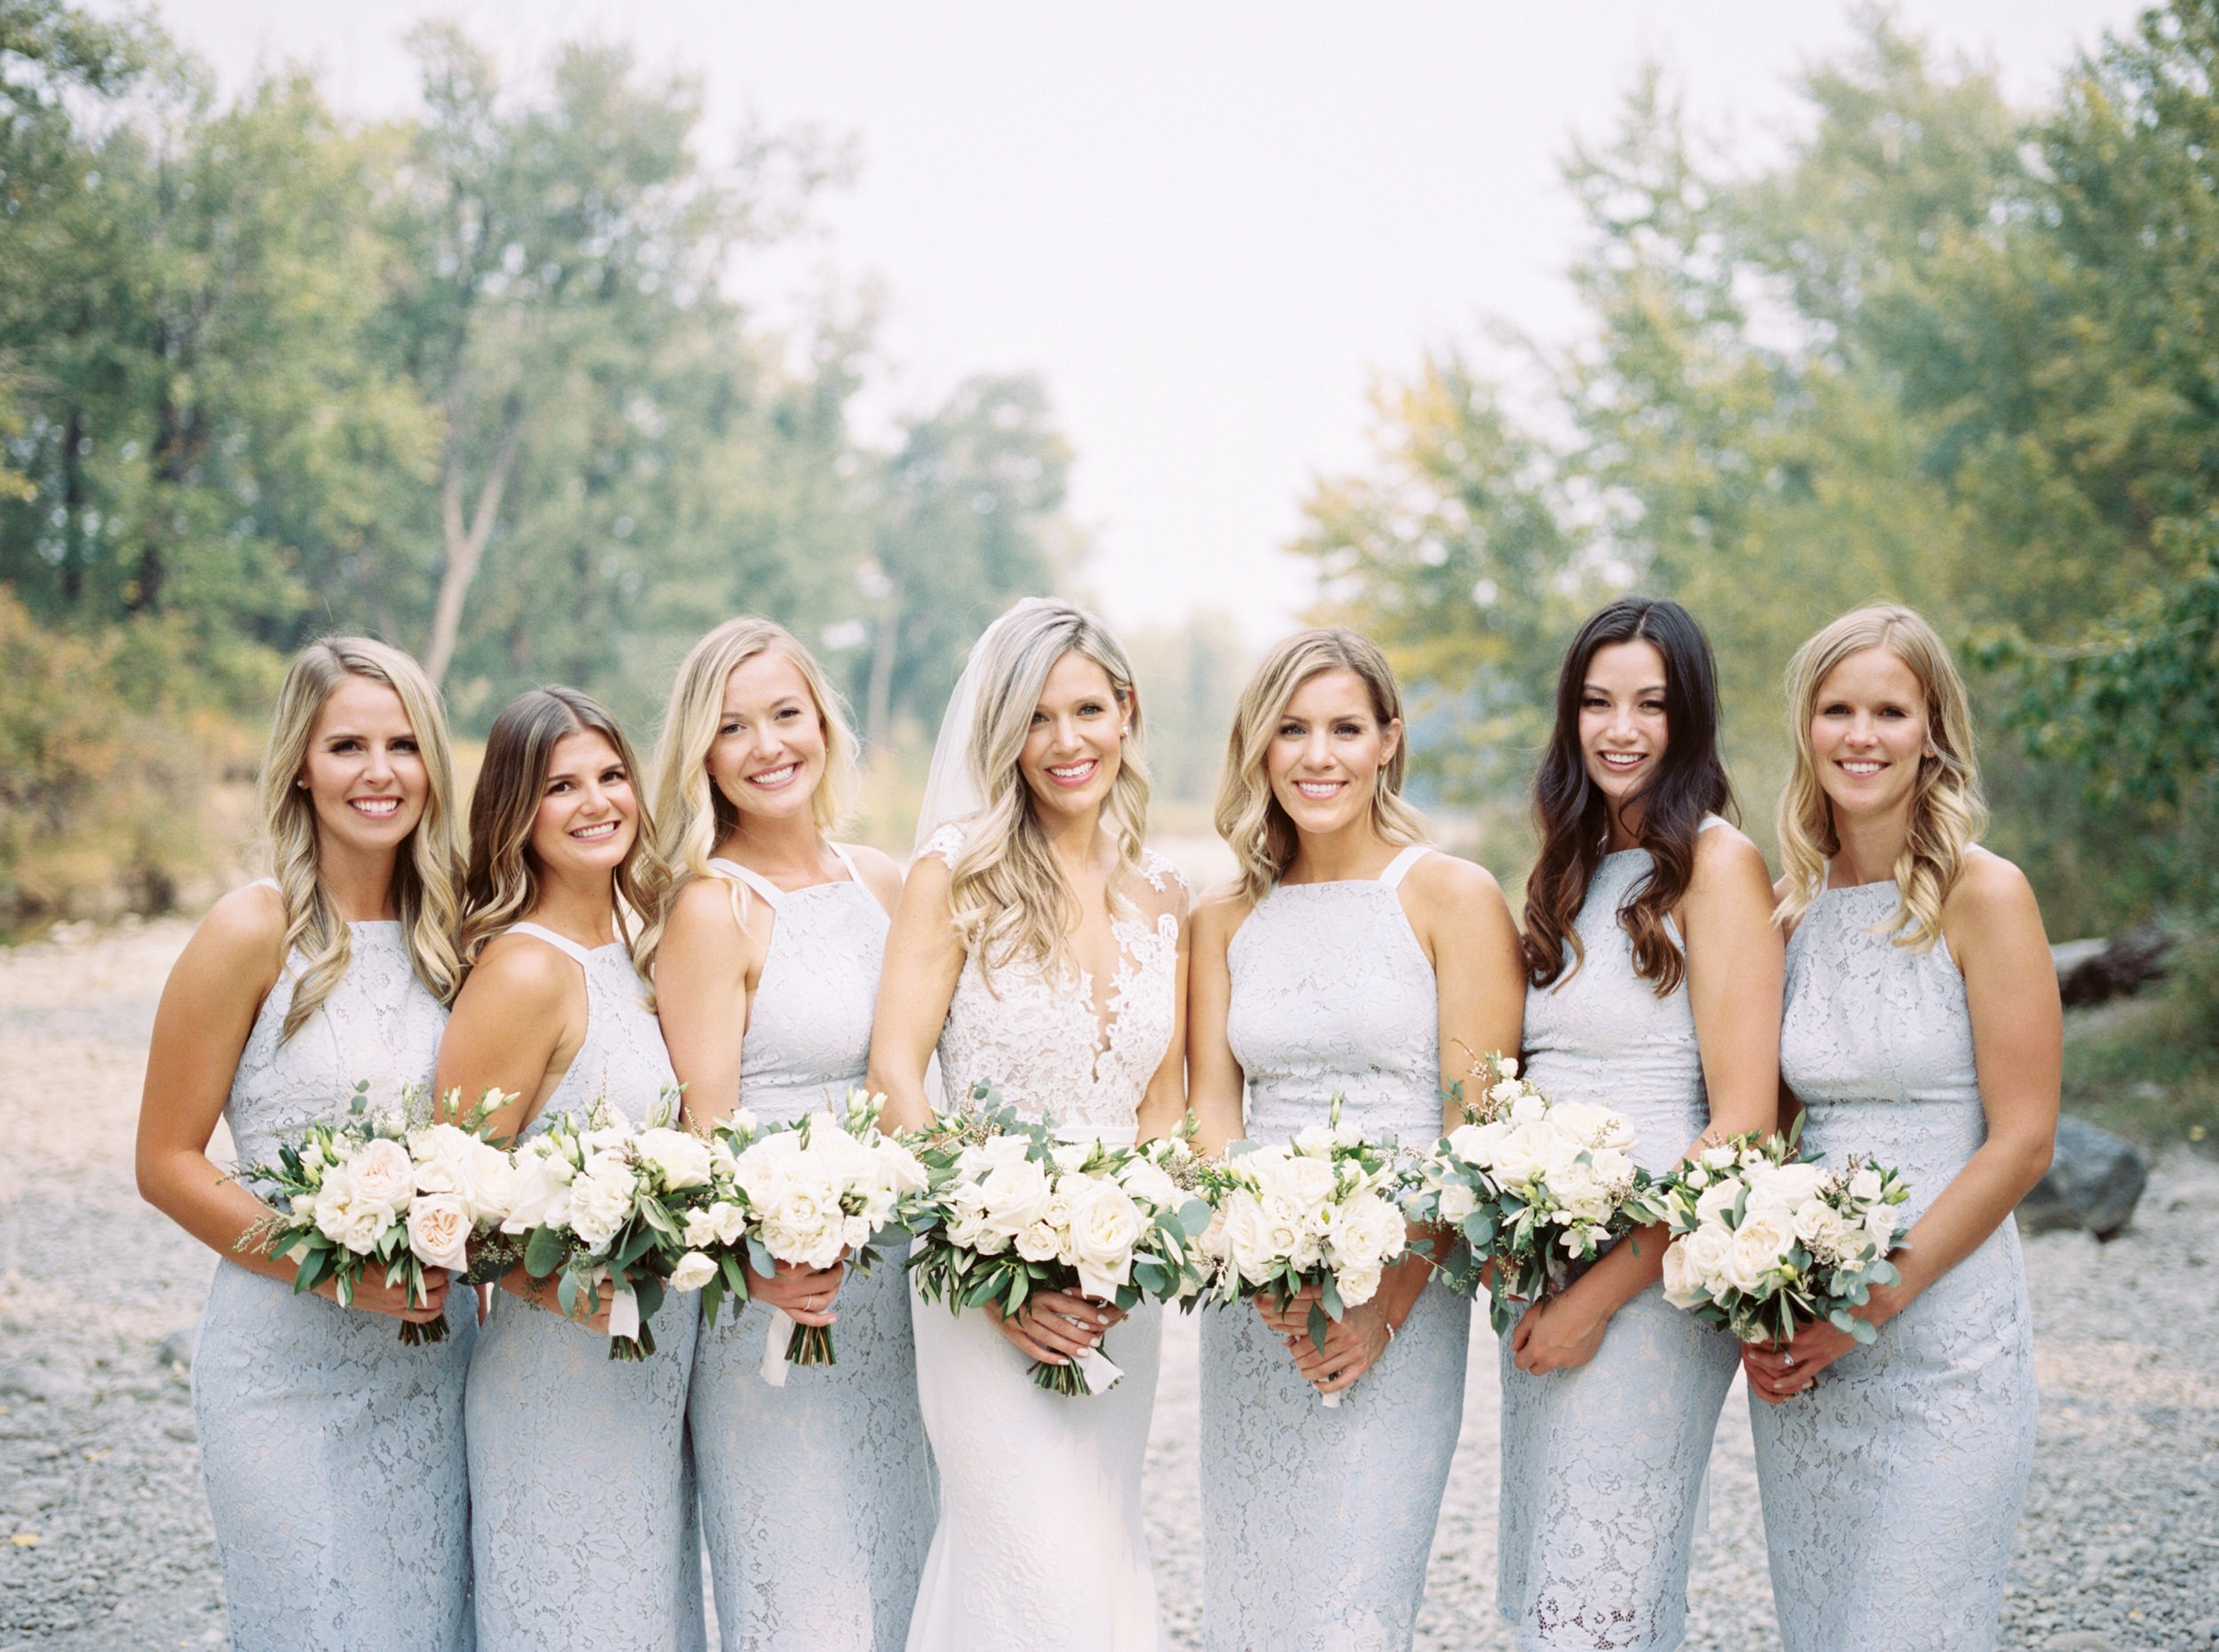 The-Lake-House-fall-wedding-Calgary-bridal-party-1.jpg